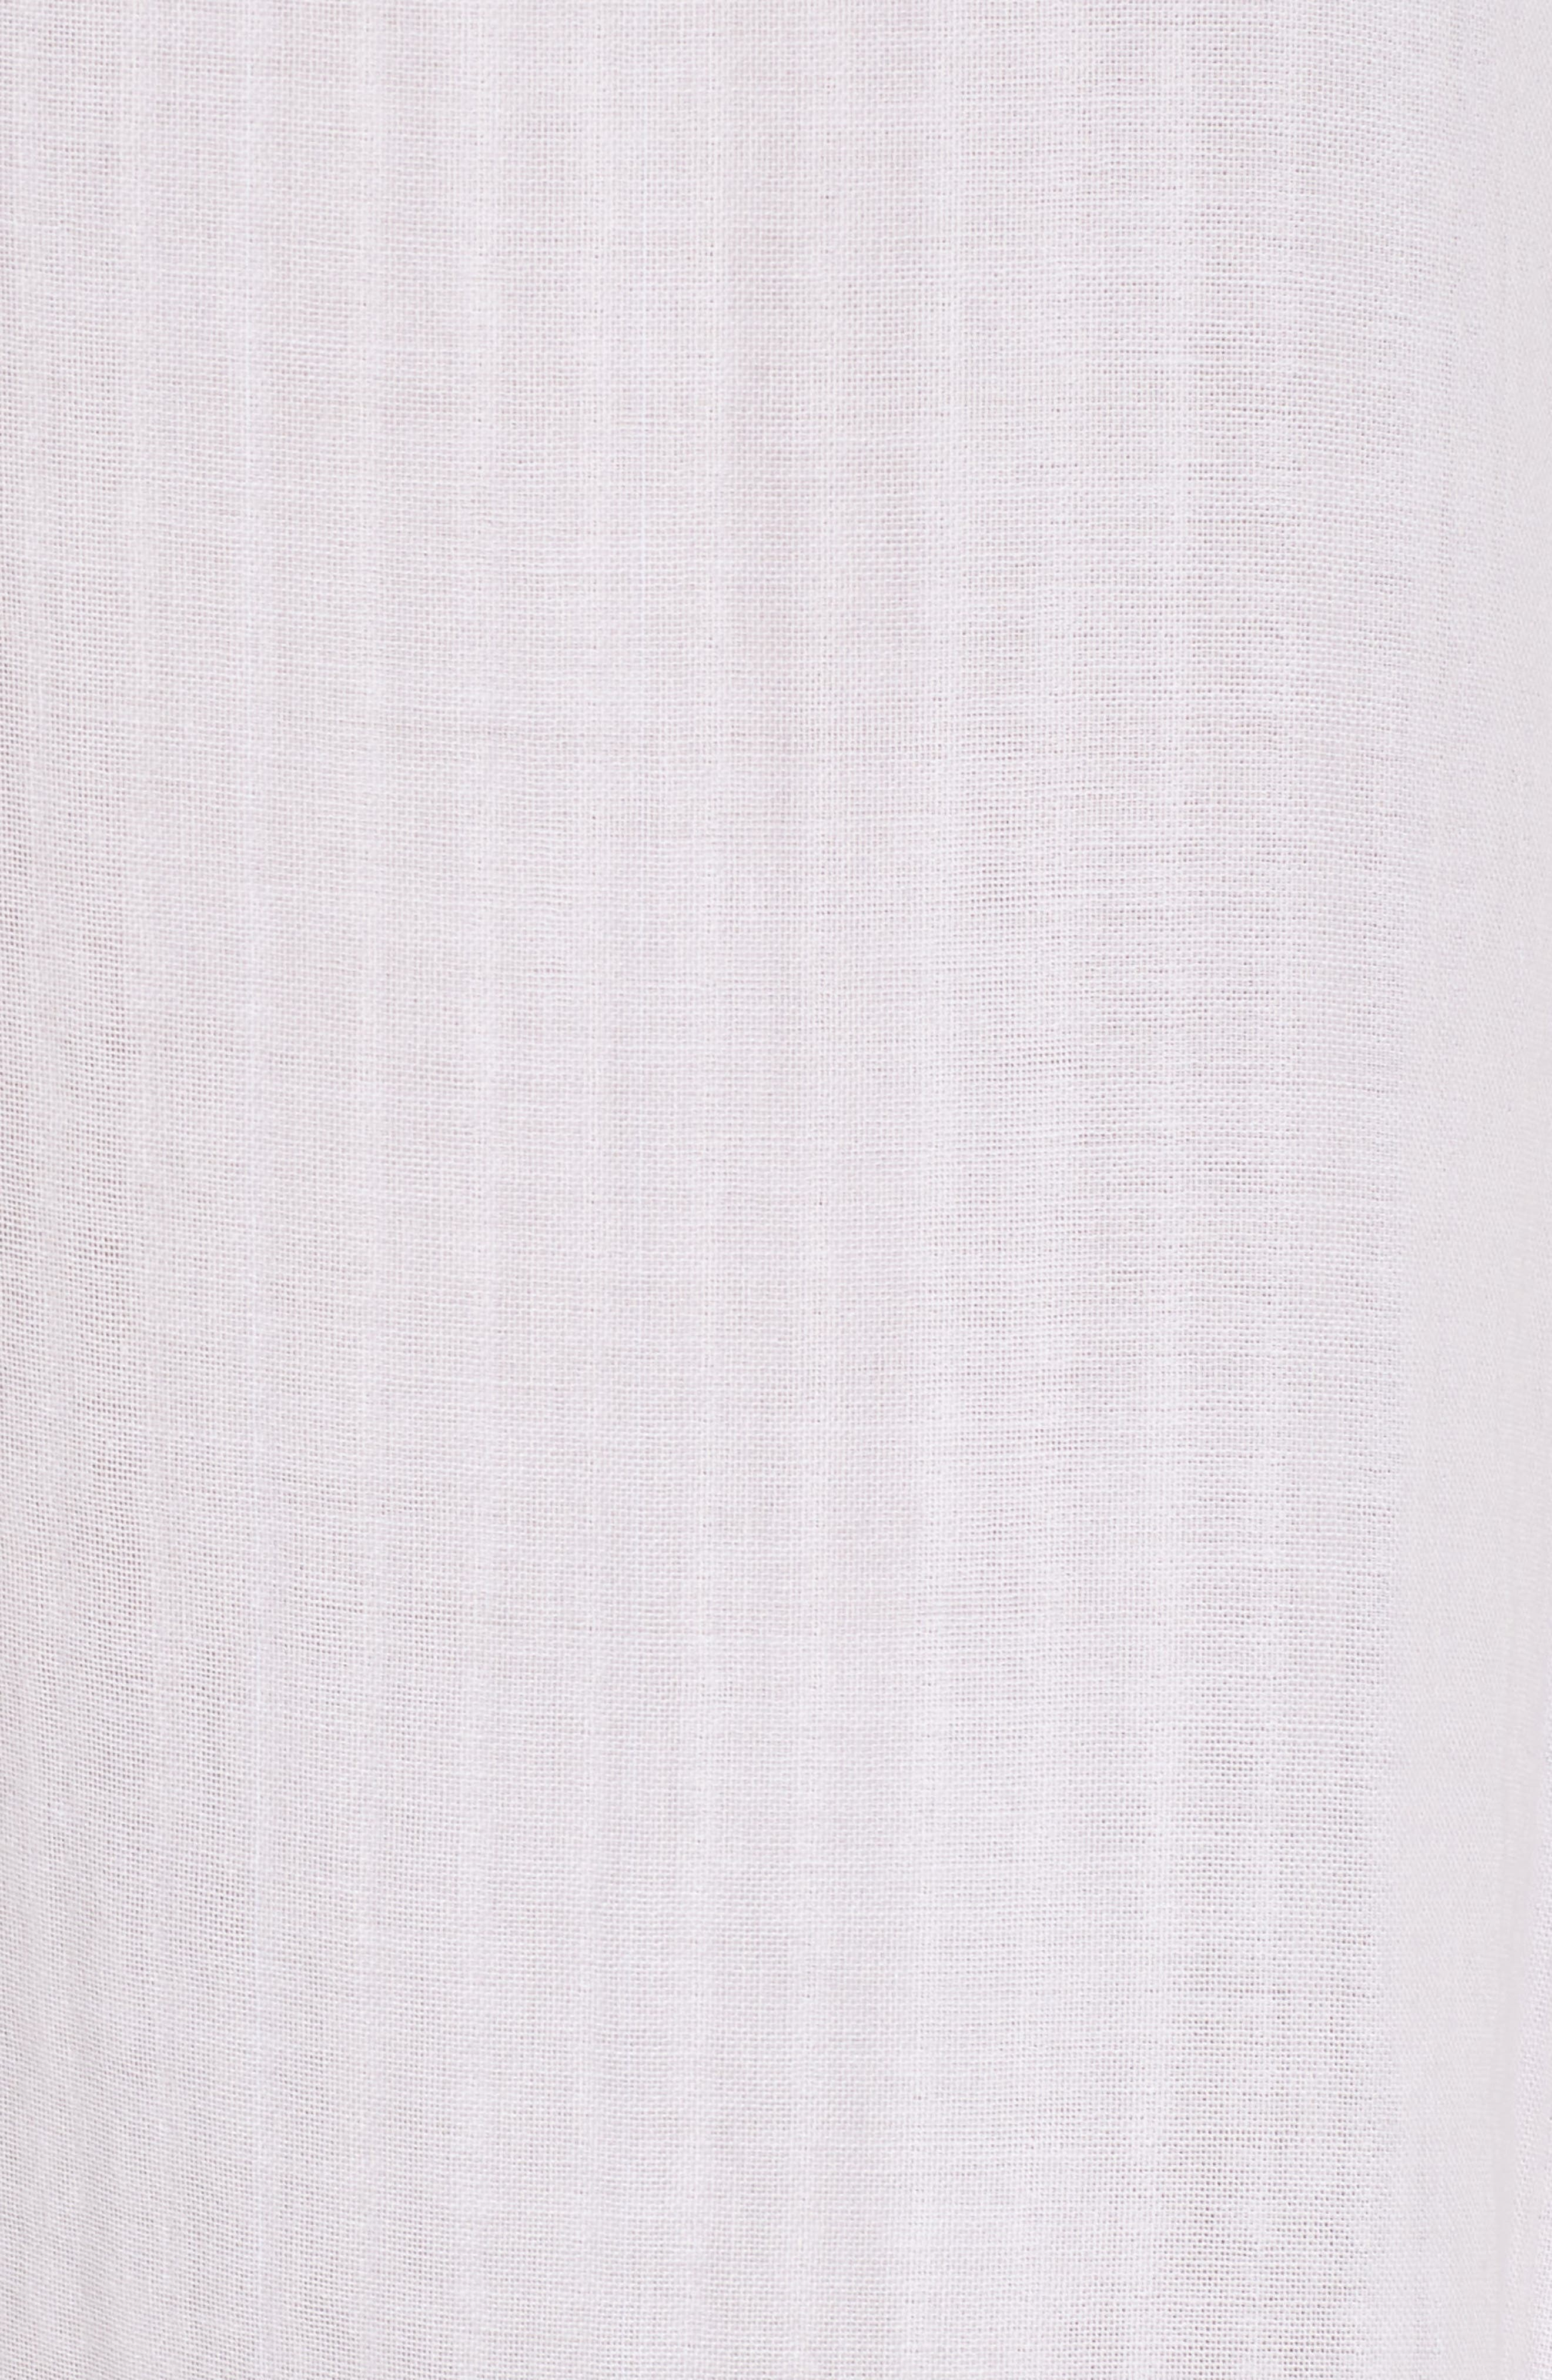 Basic Stripe Nightgown,                             Alternate thumbnail 5, color,                             110